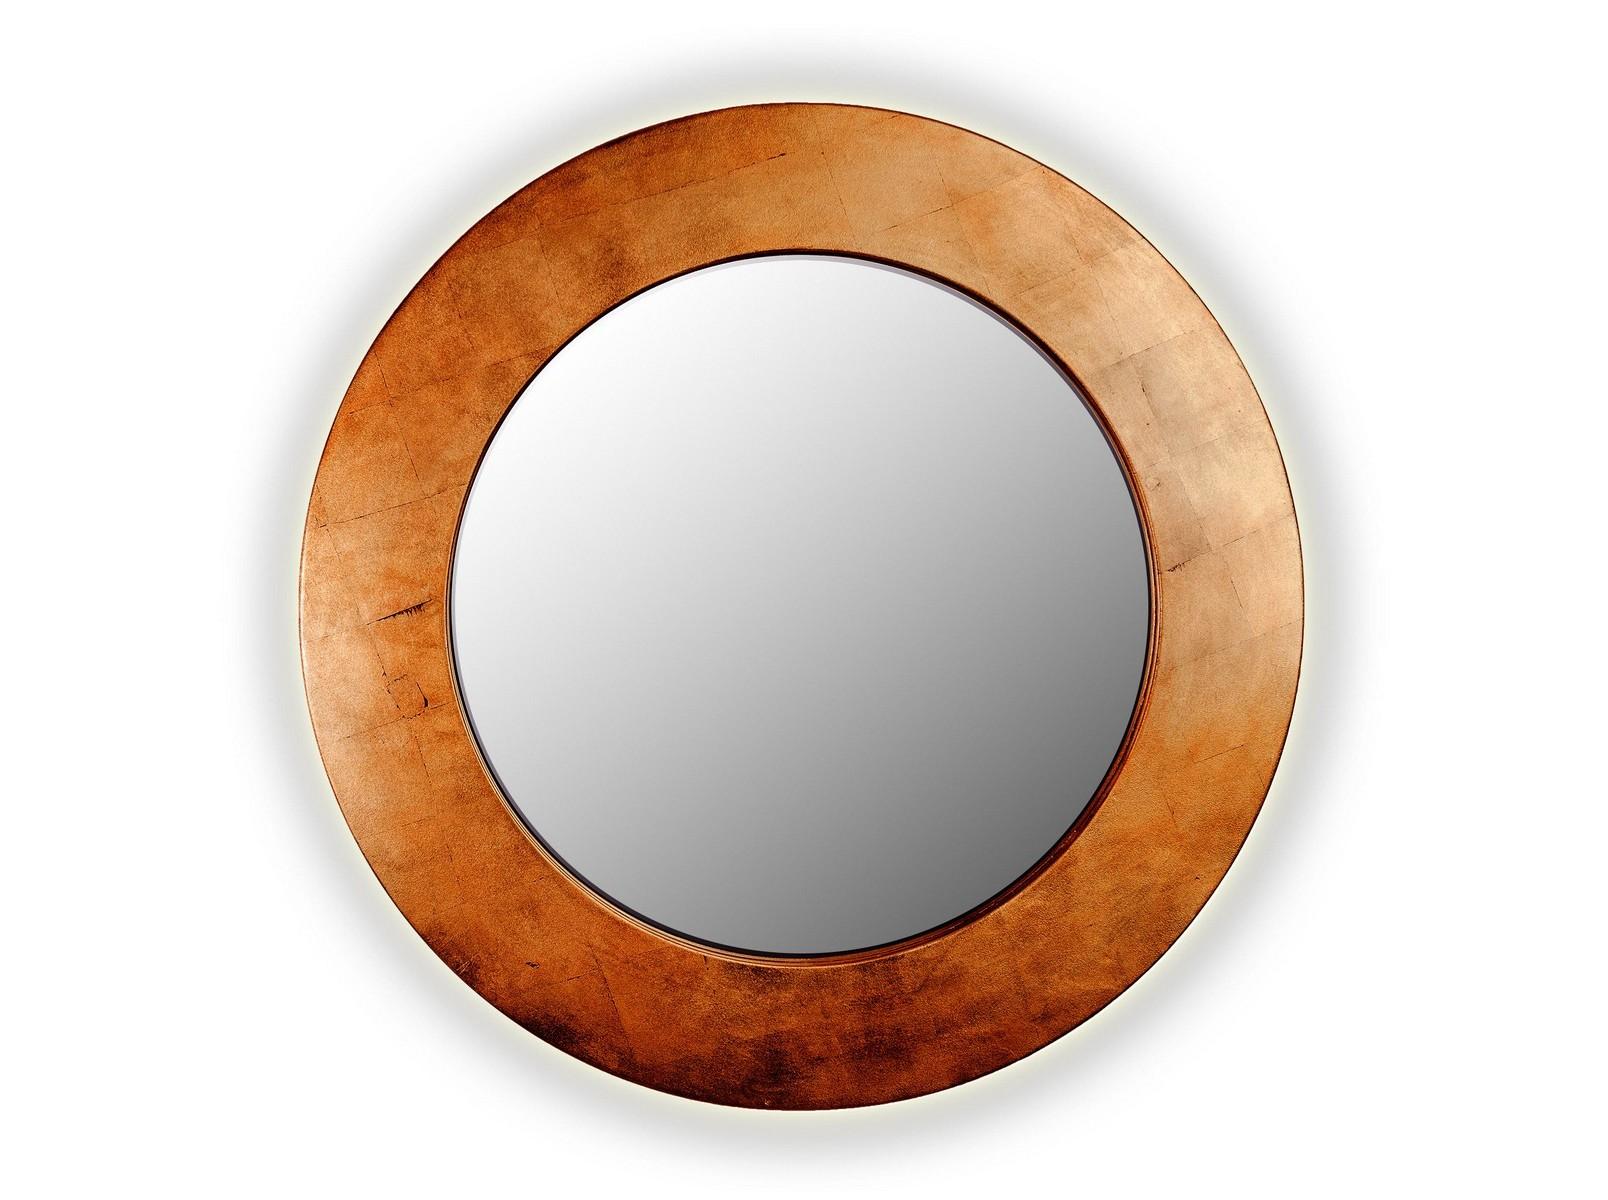 Зеркало PIECESНастенные зеркала<br><br><br>Material: Дерево<br>Глубина см: 4